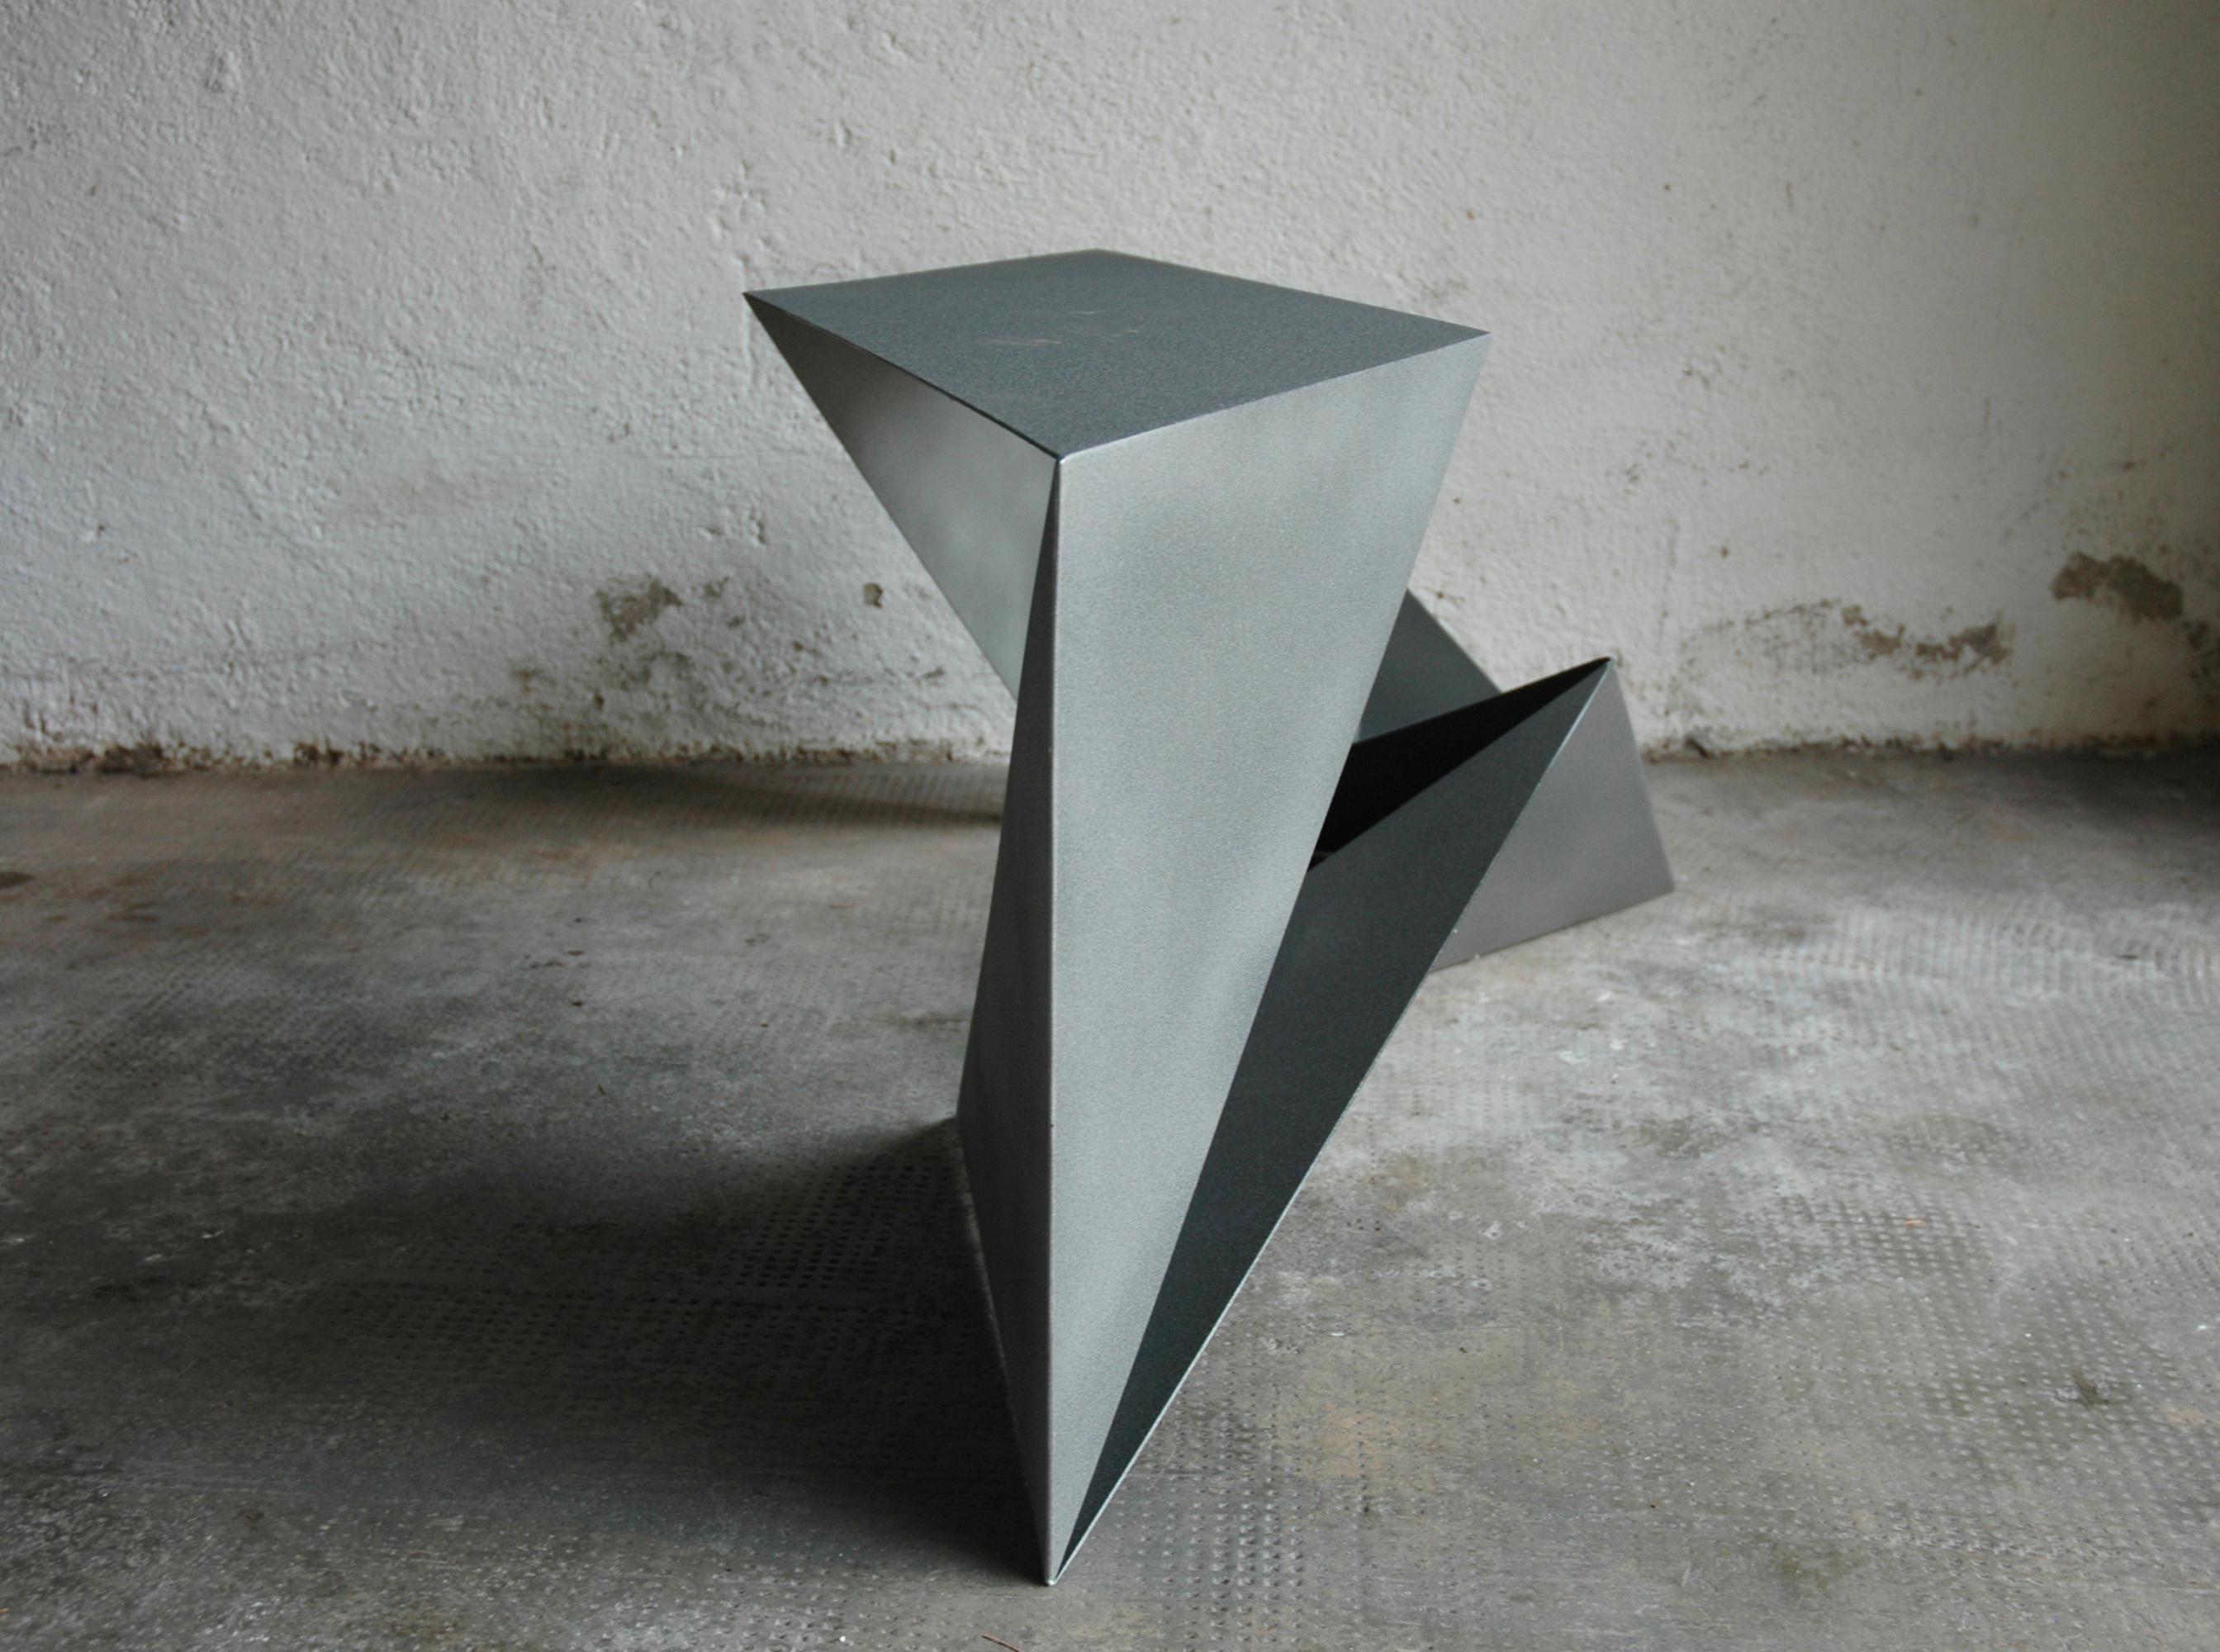 moebius fold by xbritt moebel